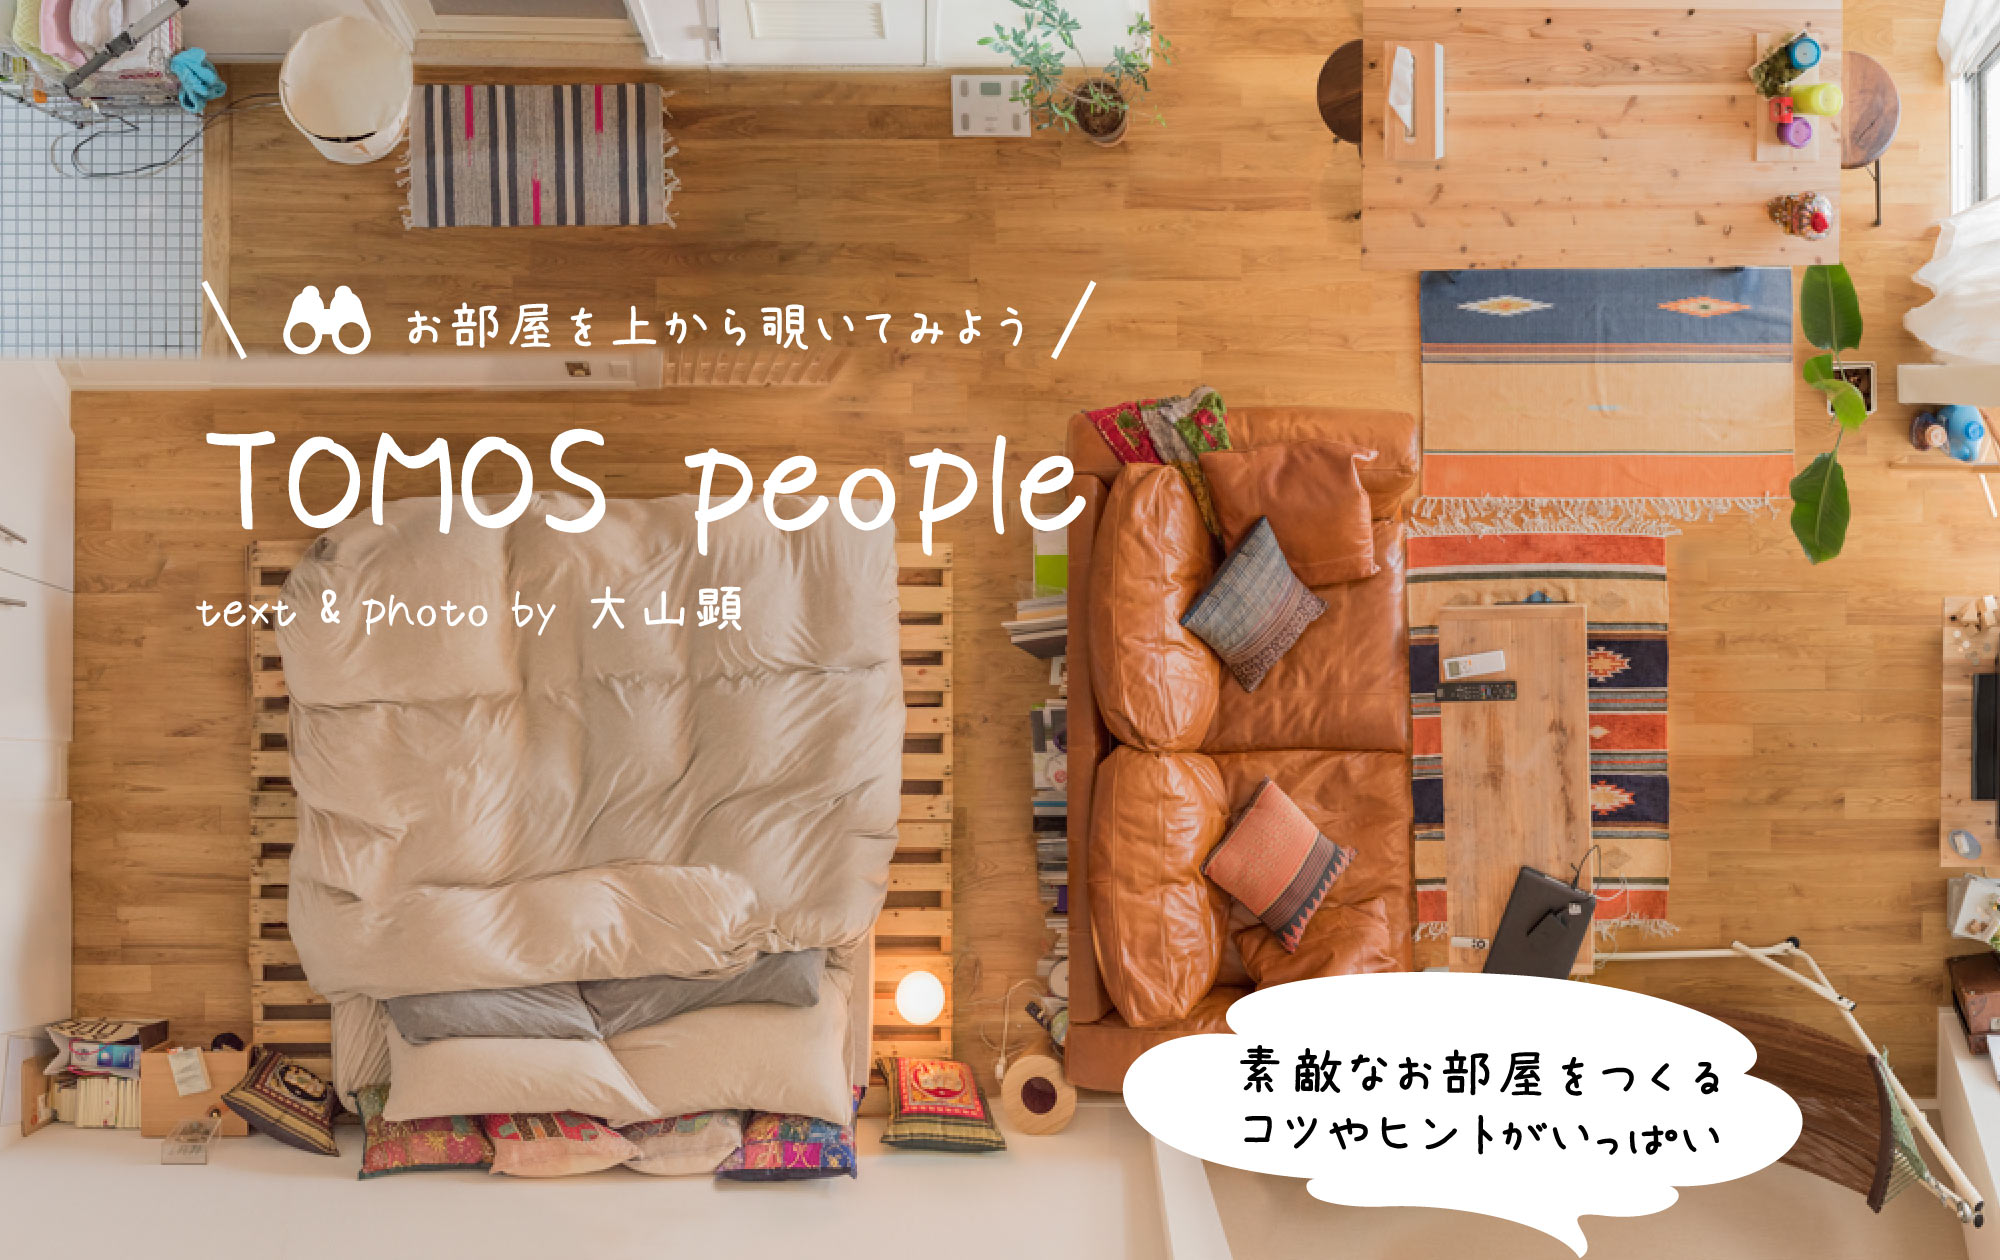 「TOMOS people」記事一覧はこちら